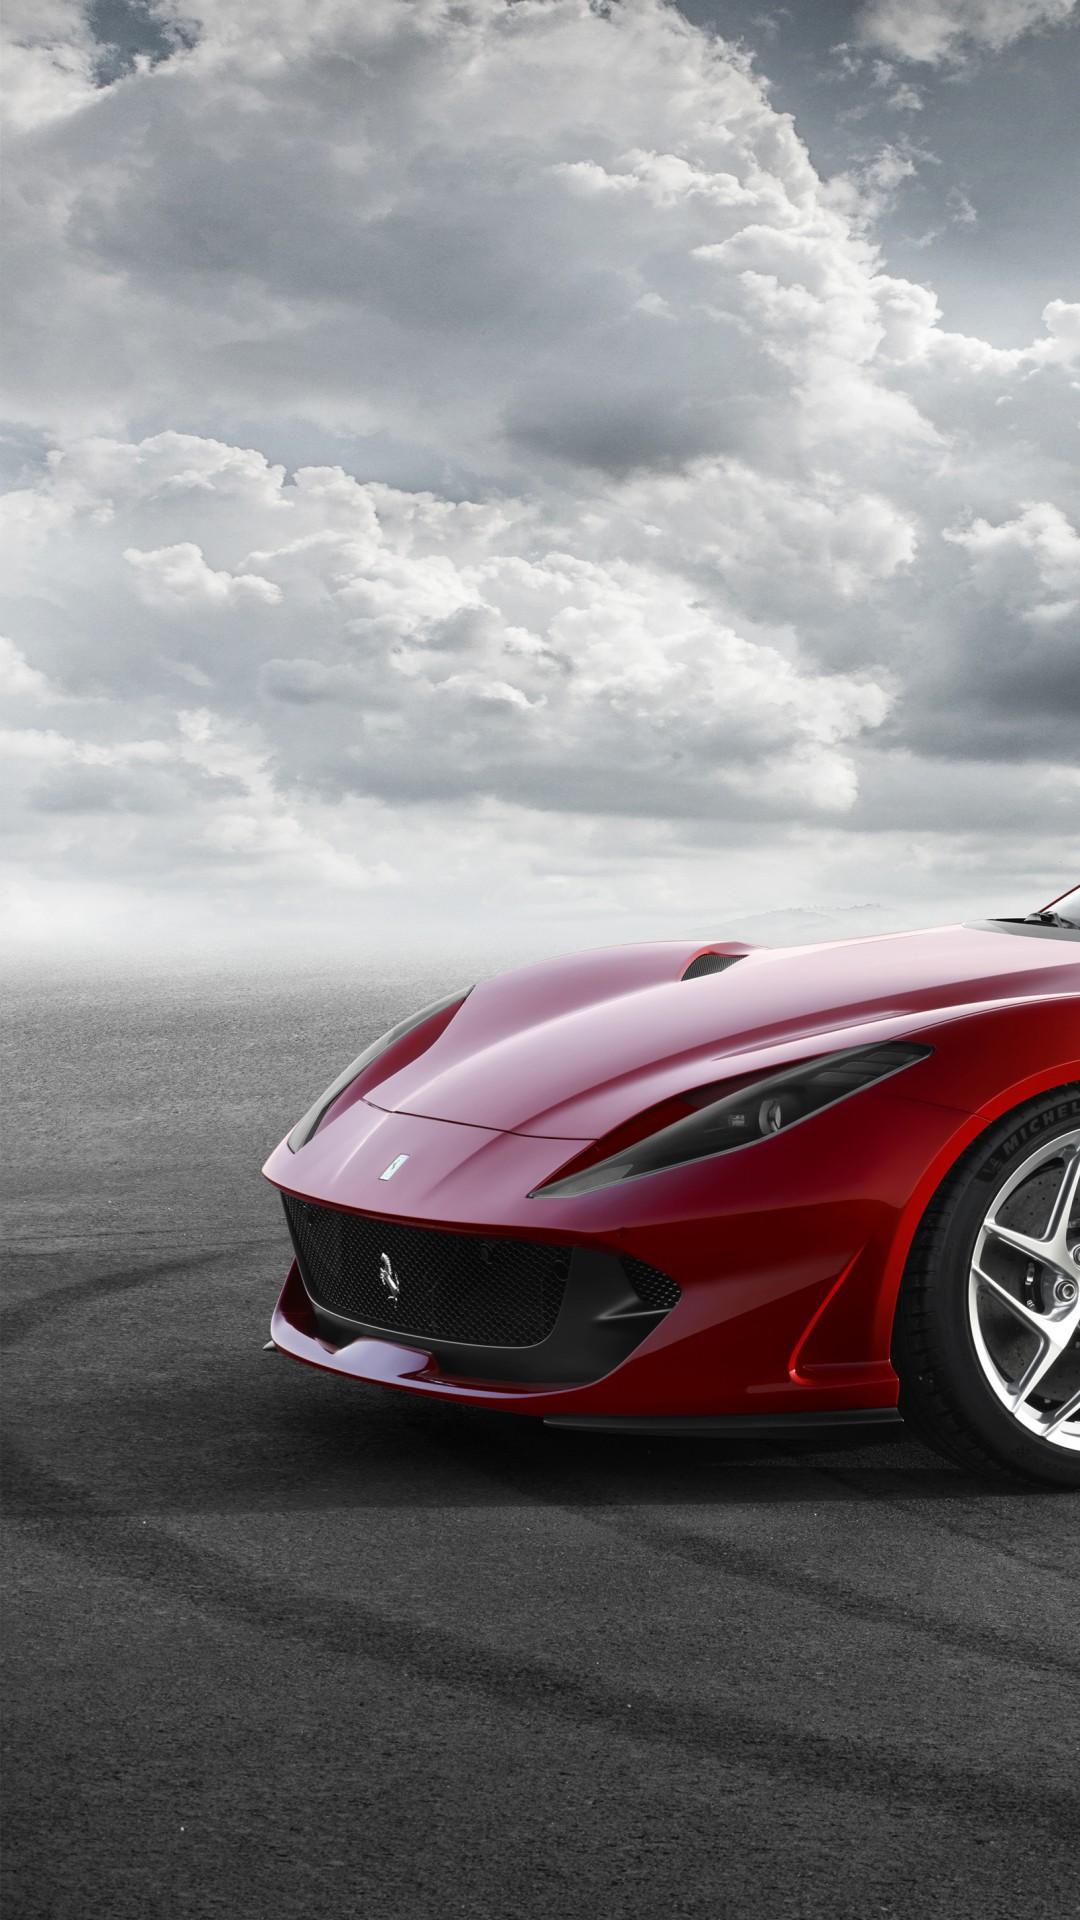 Jaguar F Type Interior >> Wallpaper Ferrari Portofino, 2018 Cars, 4k, Cars & Bikes ...